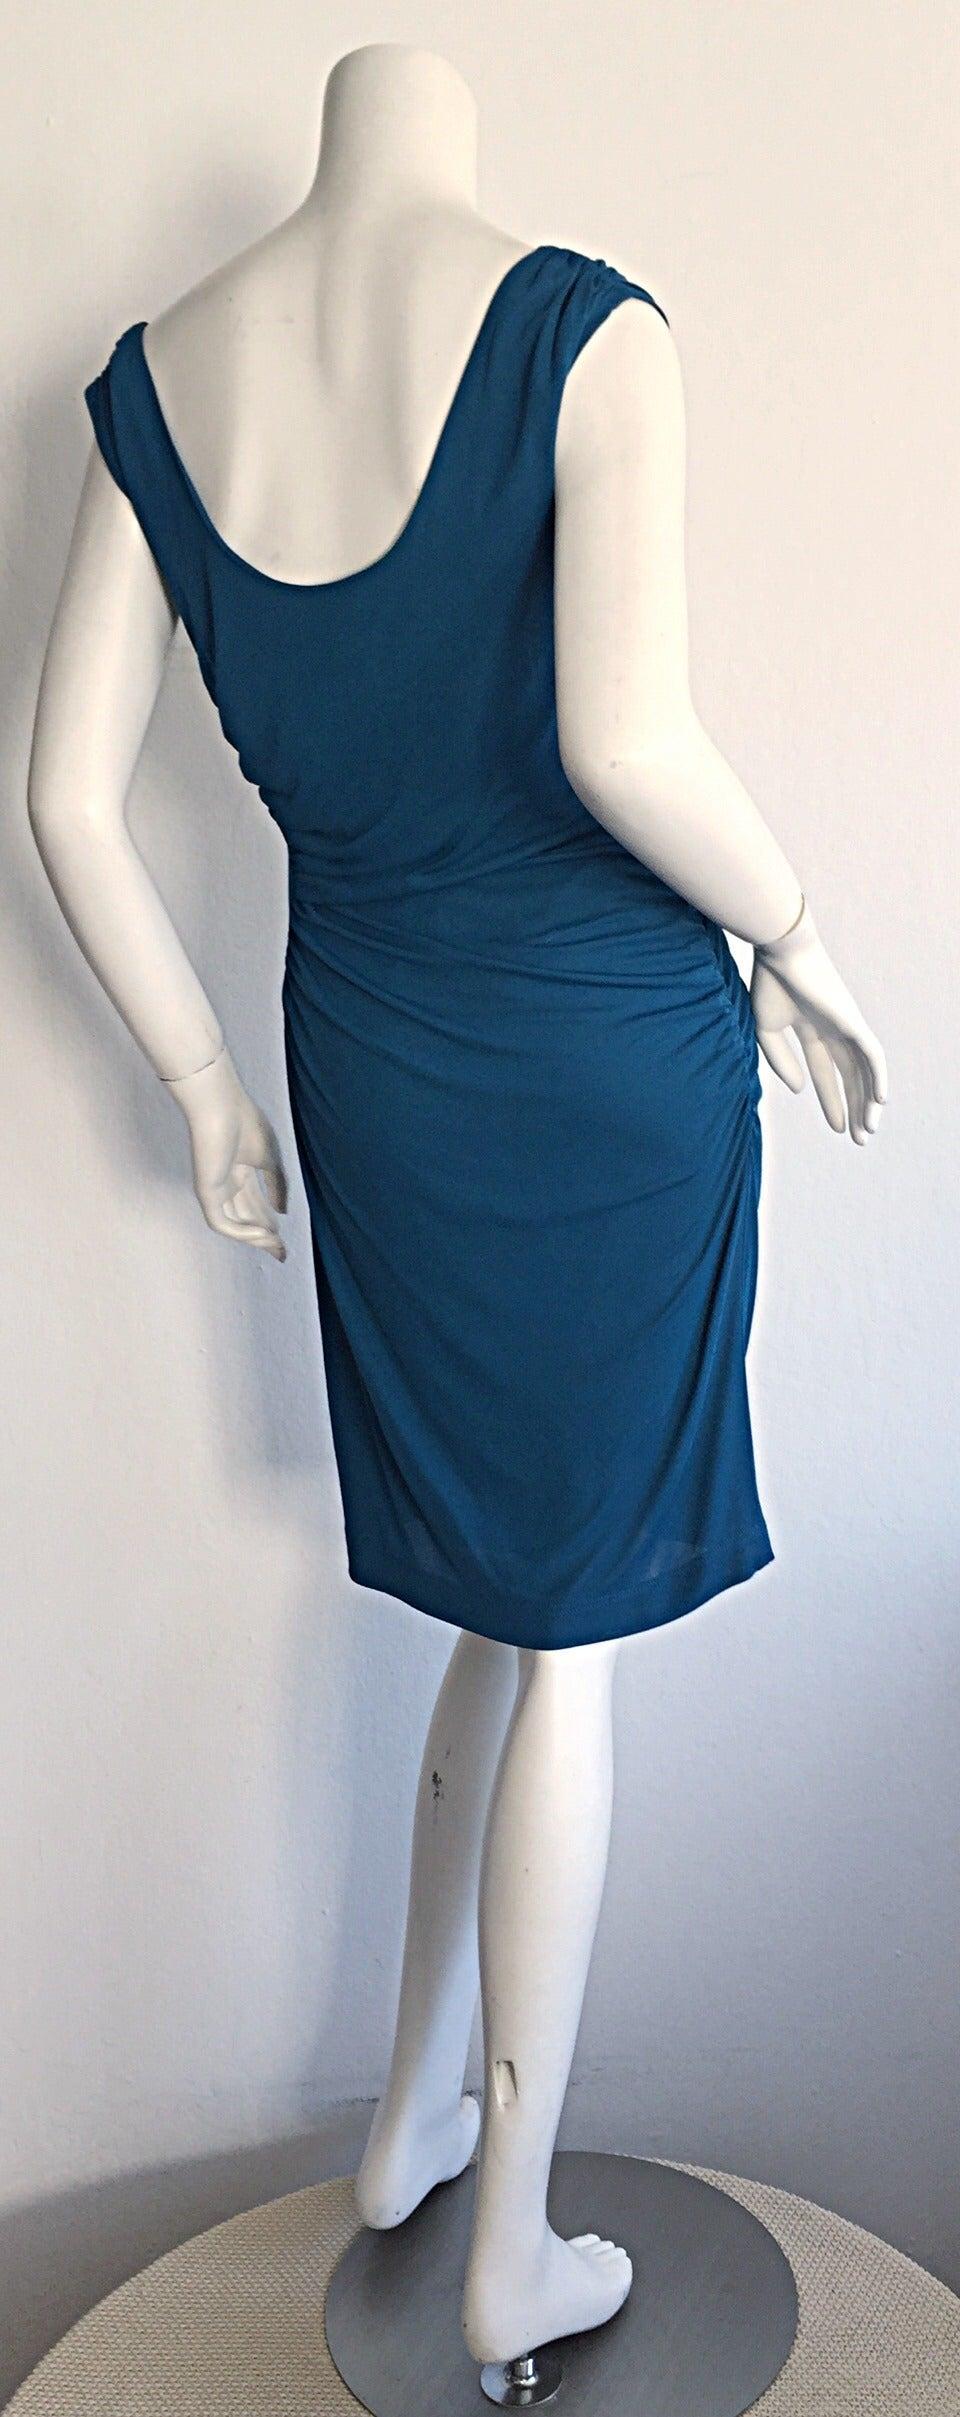 1990s Alberta Ferretti Size 6 / 8 Vintage Blue Jersey Draped Grecian Dress In Excellent Condition For Sale In Chicago, IL